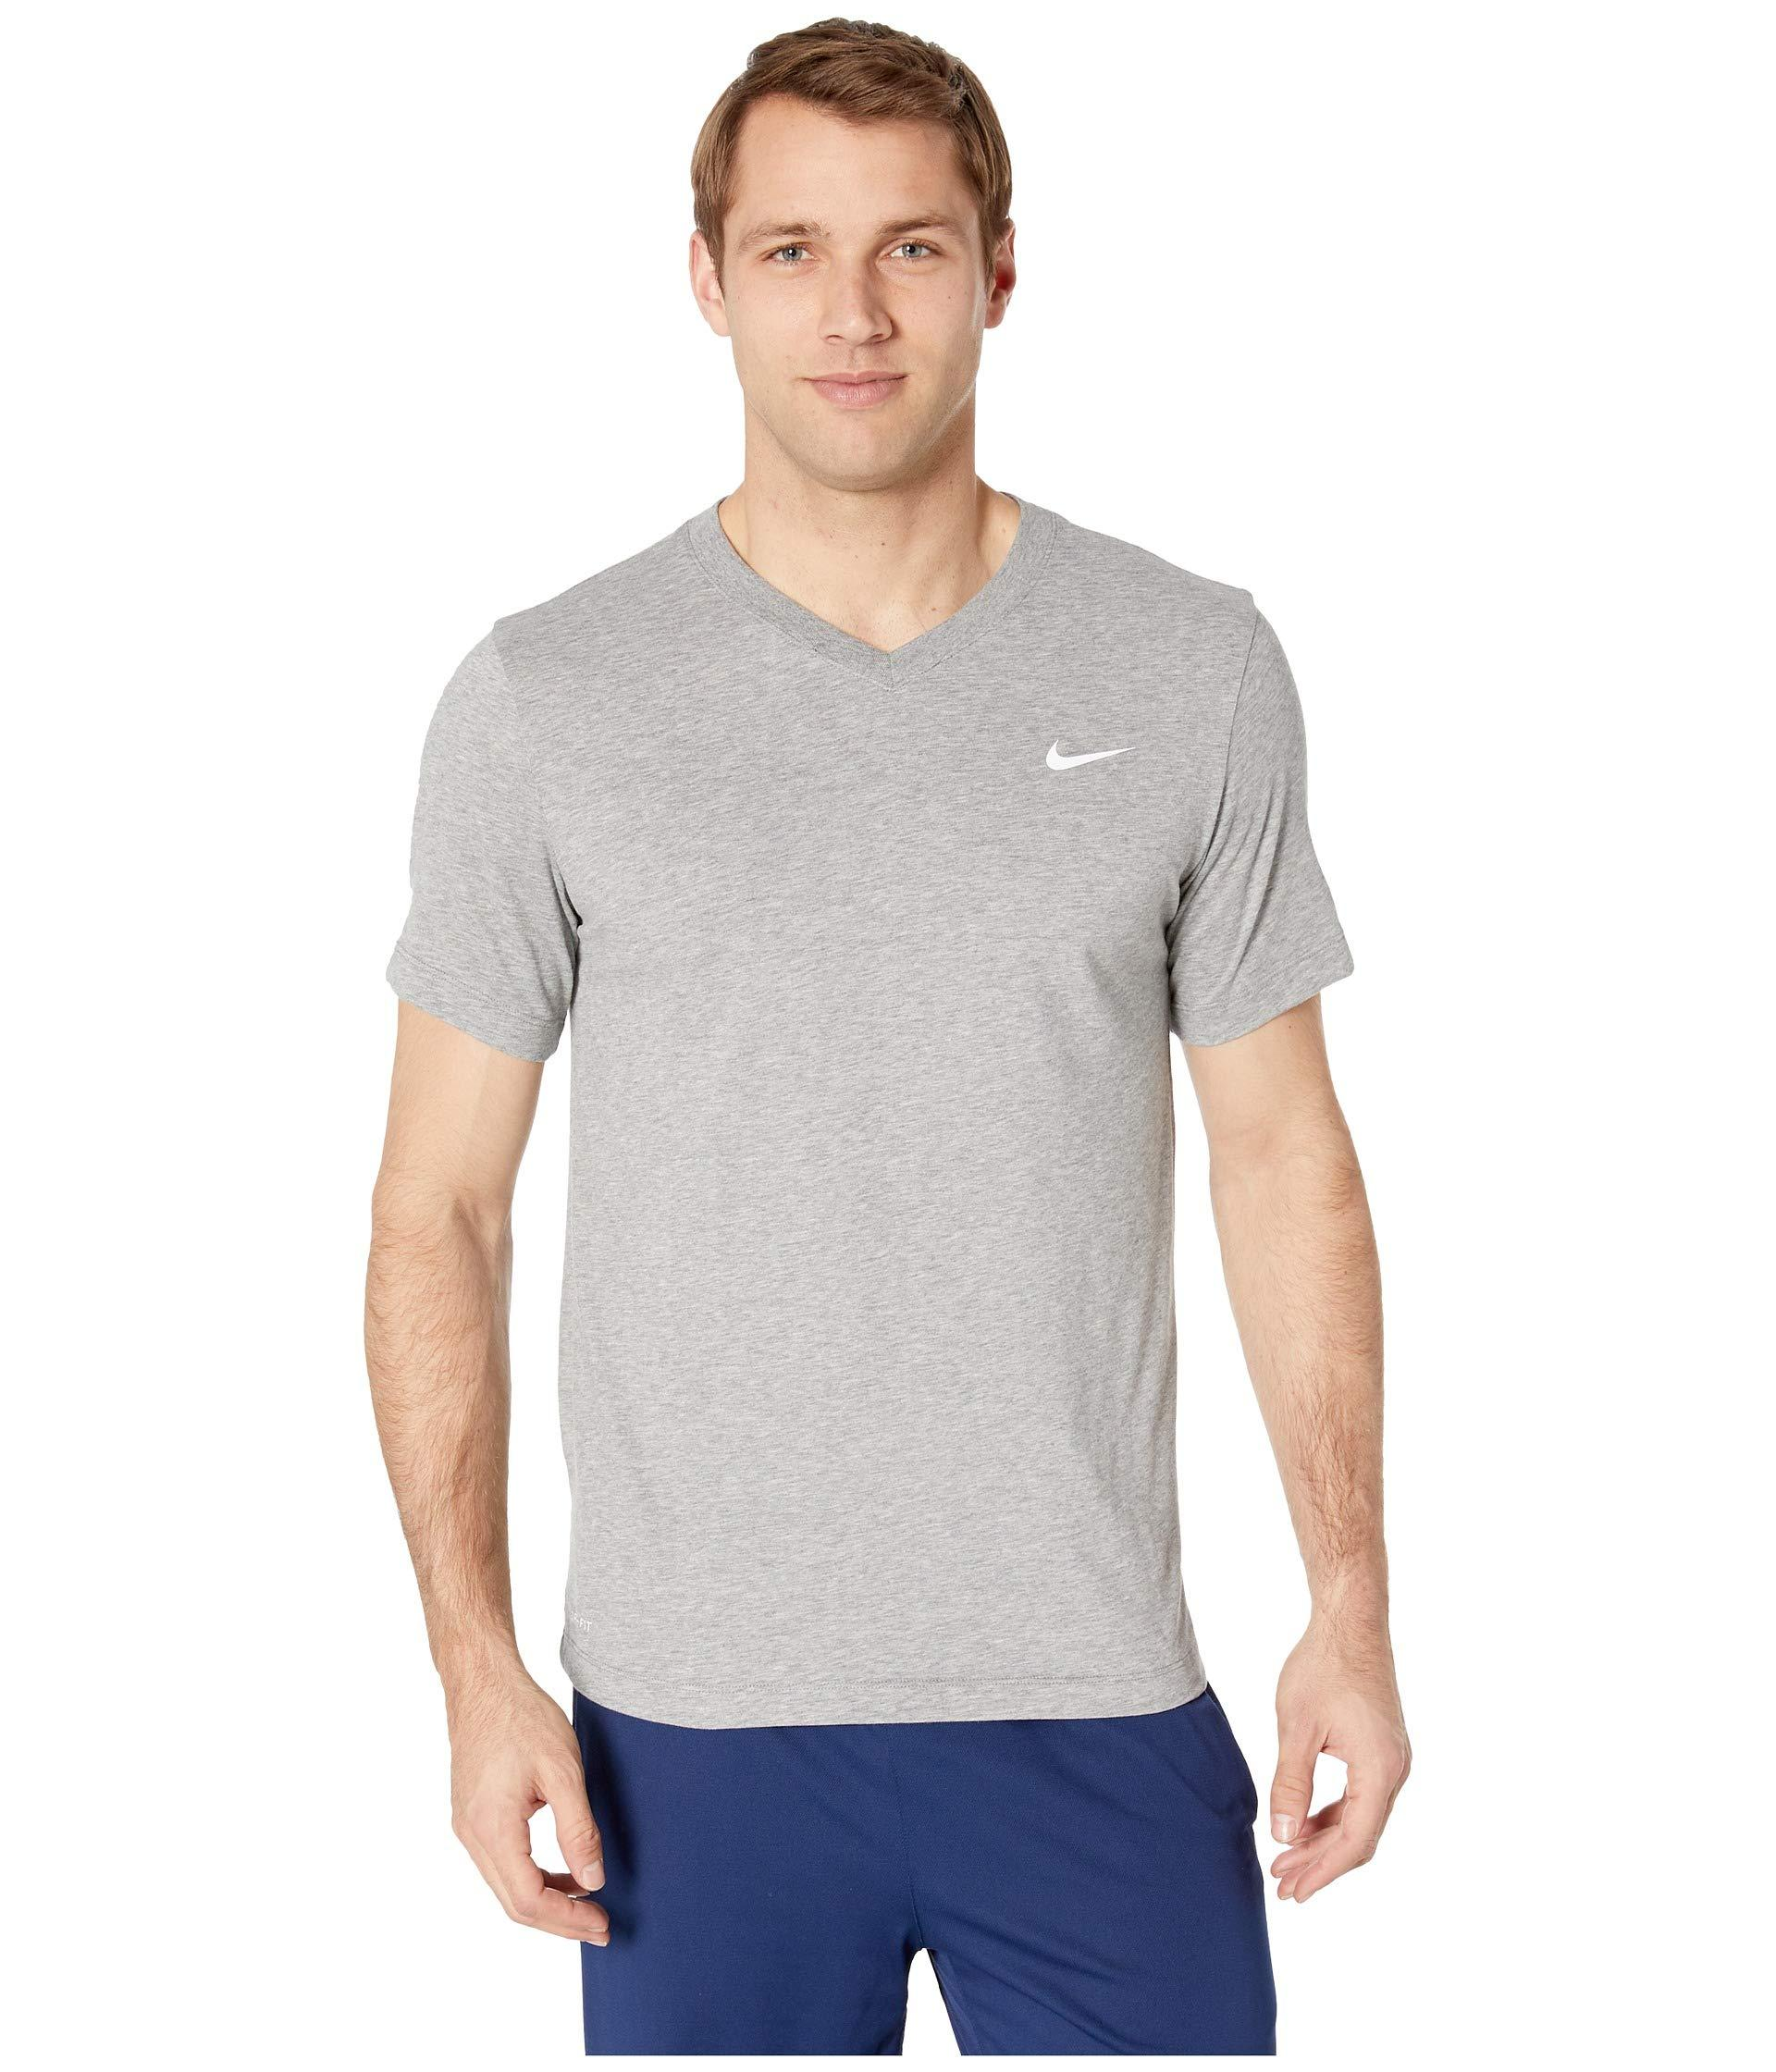 5caa8085a835 Lyst - Nike Dry Tee Dri-fit Cotton V Solid (nightshade orange Peel ...